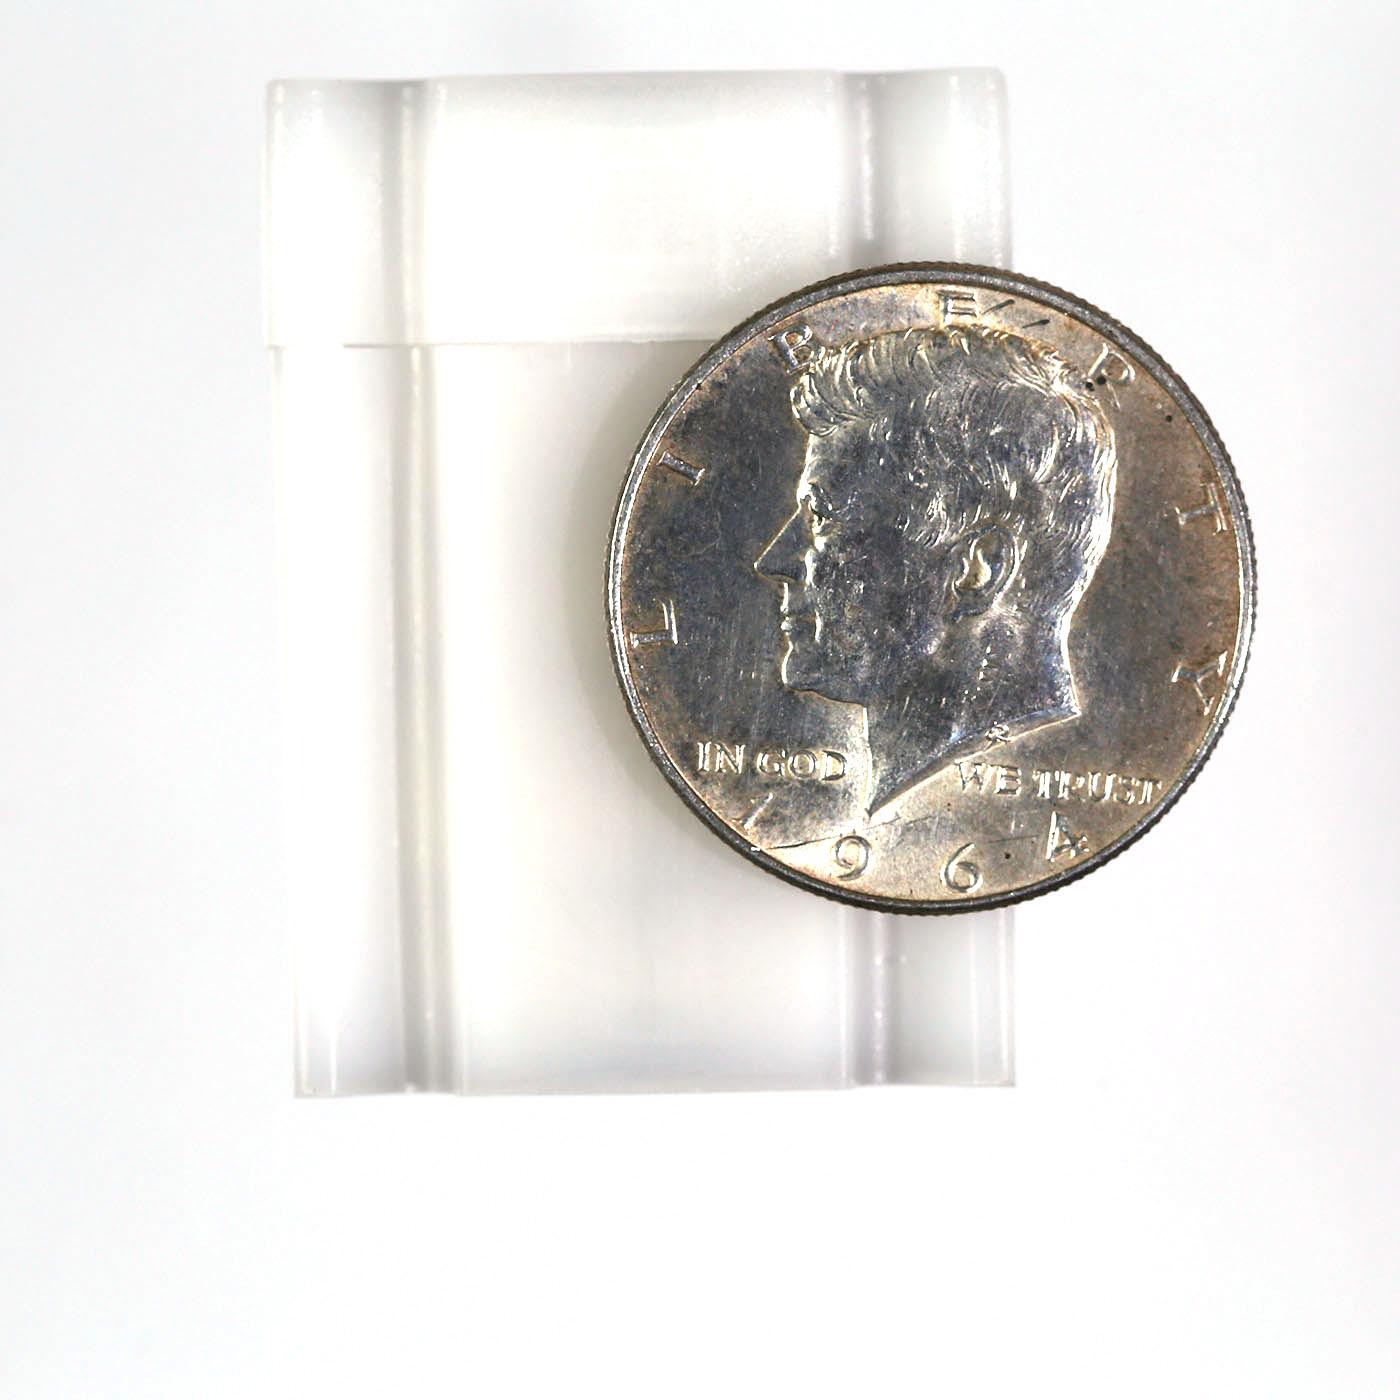 90% Silver Kennedy Halves Roll (20pcs.)